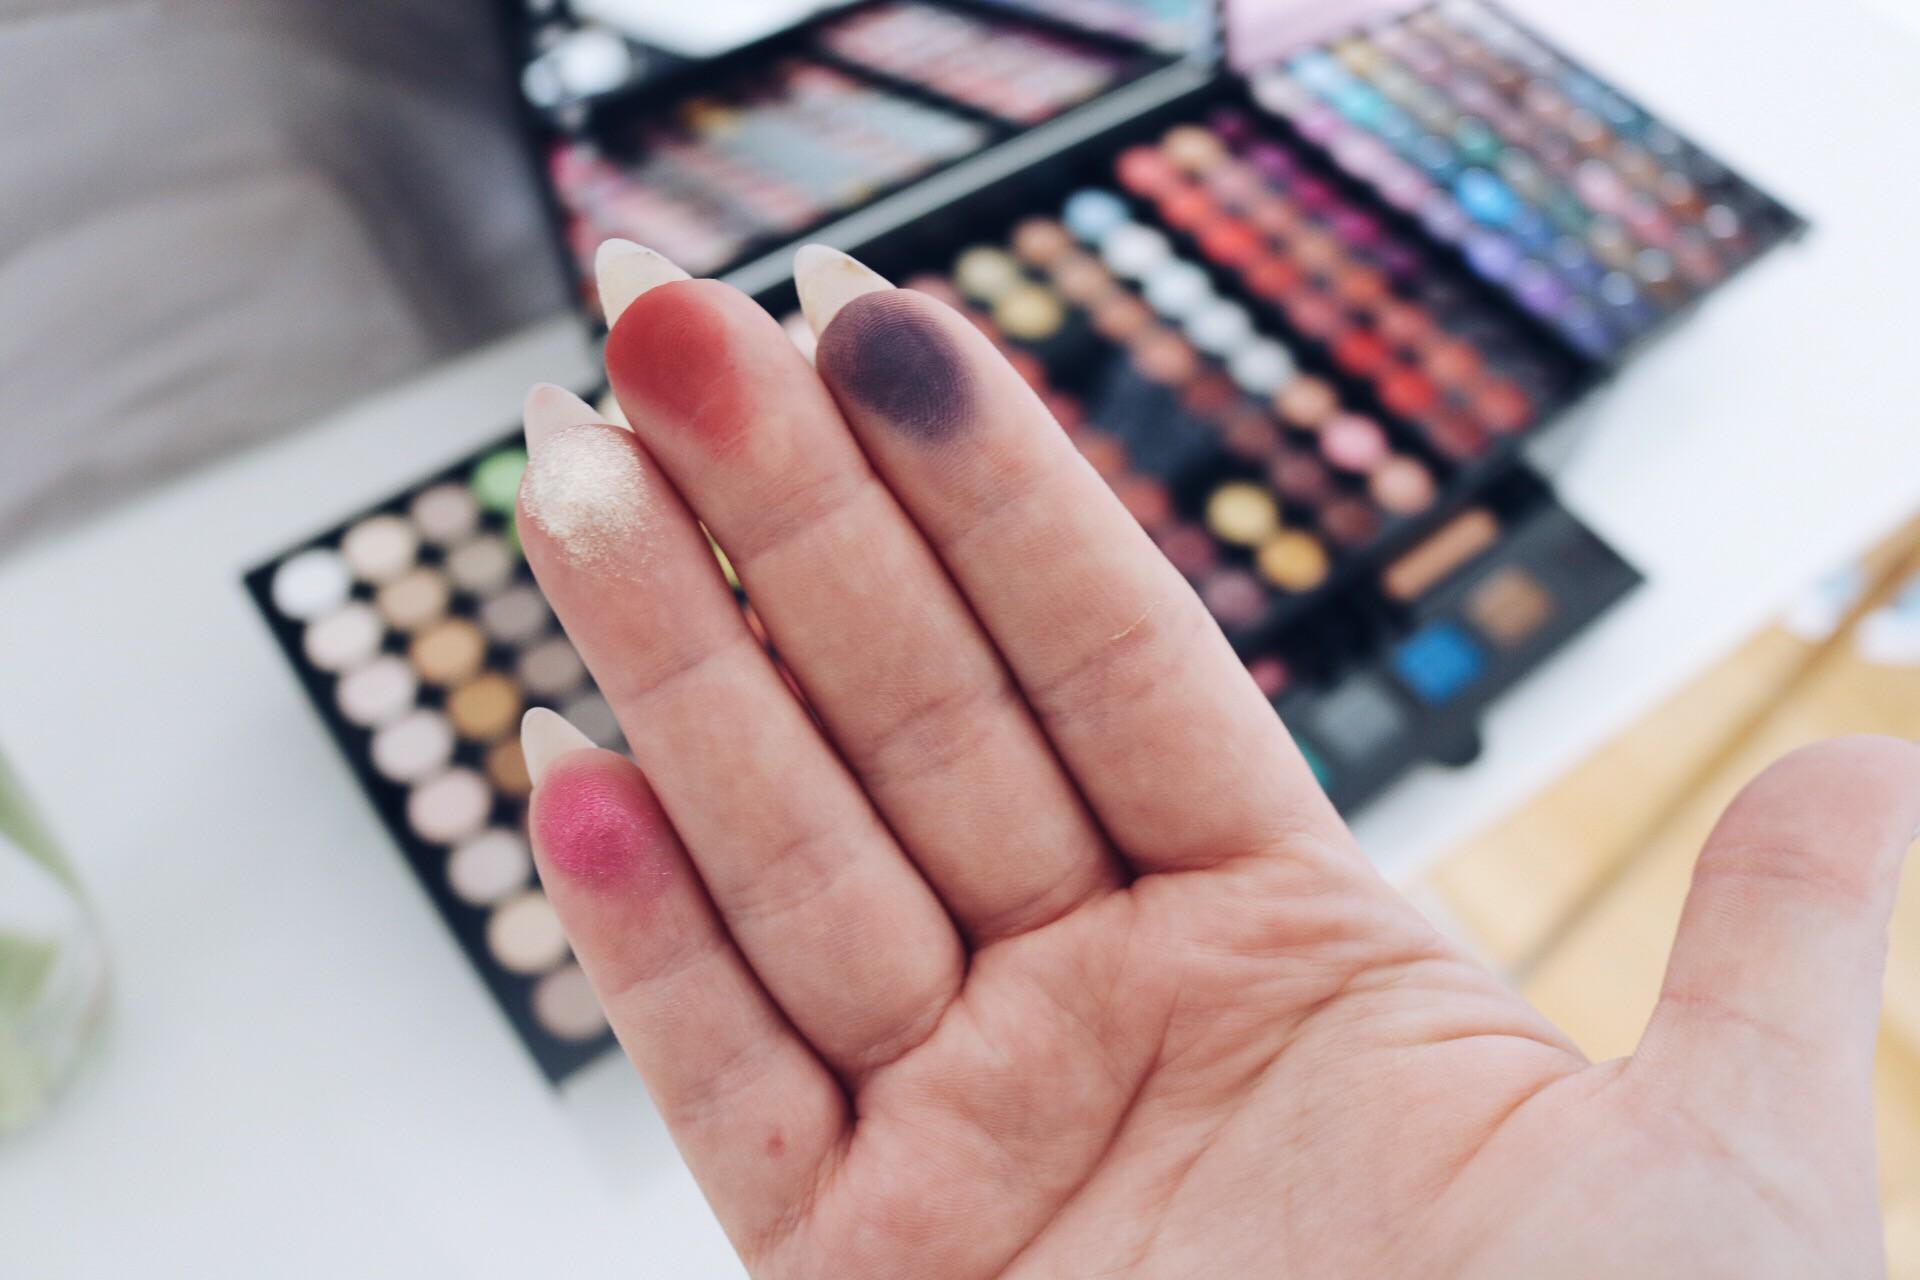 Sephora Palette Makeup Studio swatches läpprodukter ögonskuggor palett